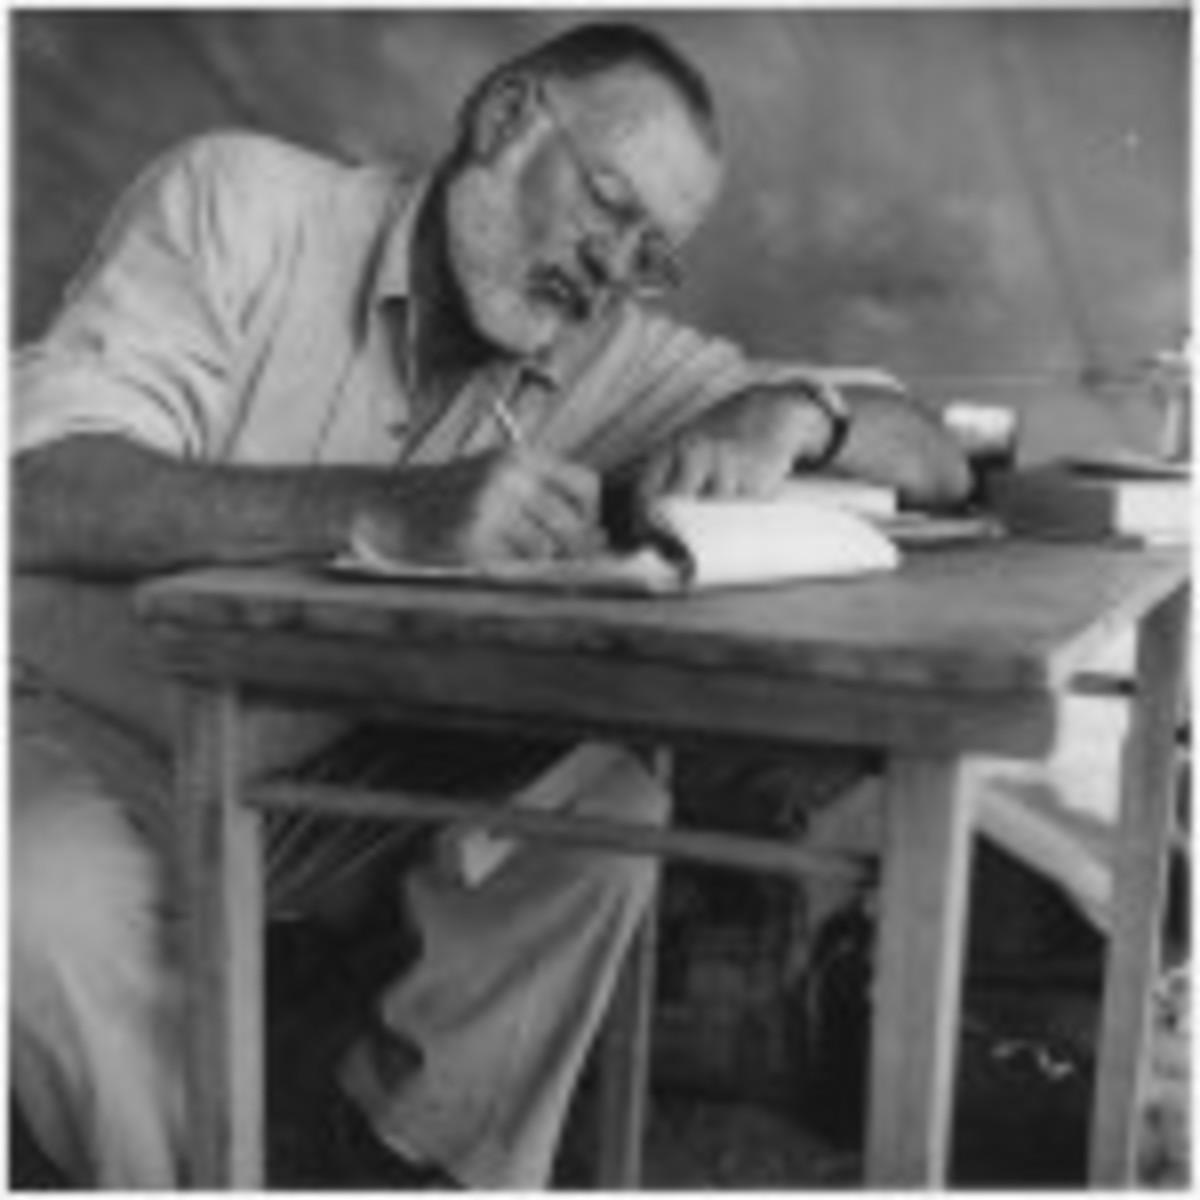 Ernest Hemingway Rewriting